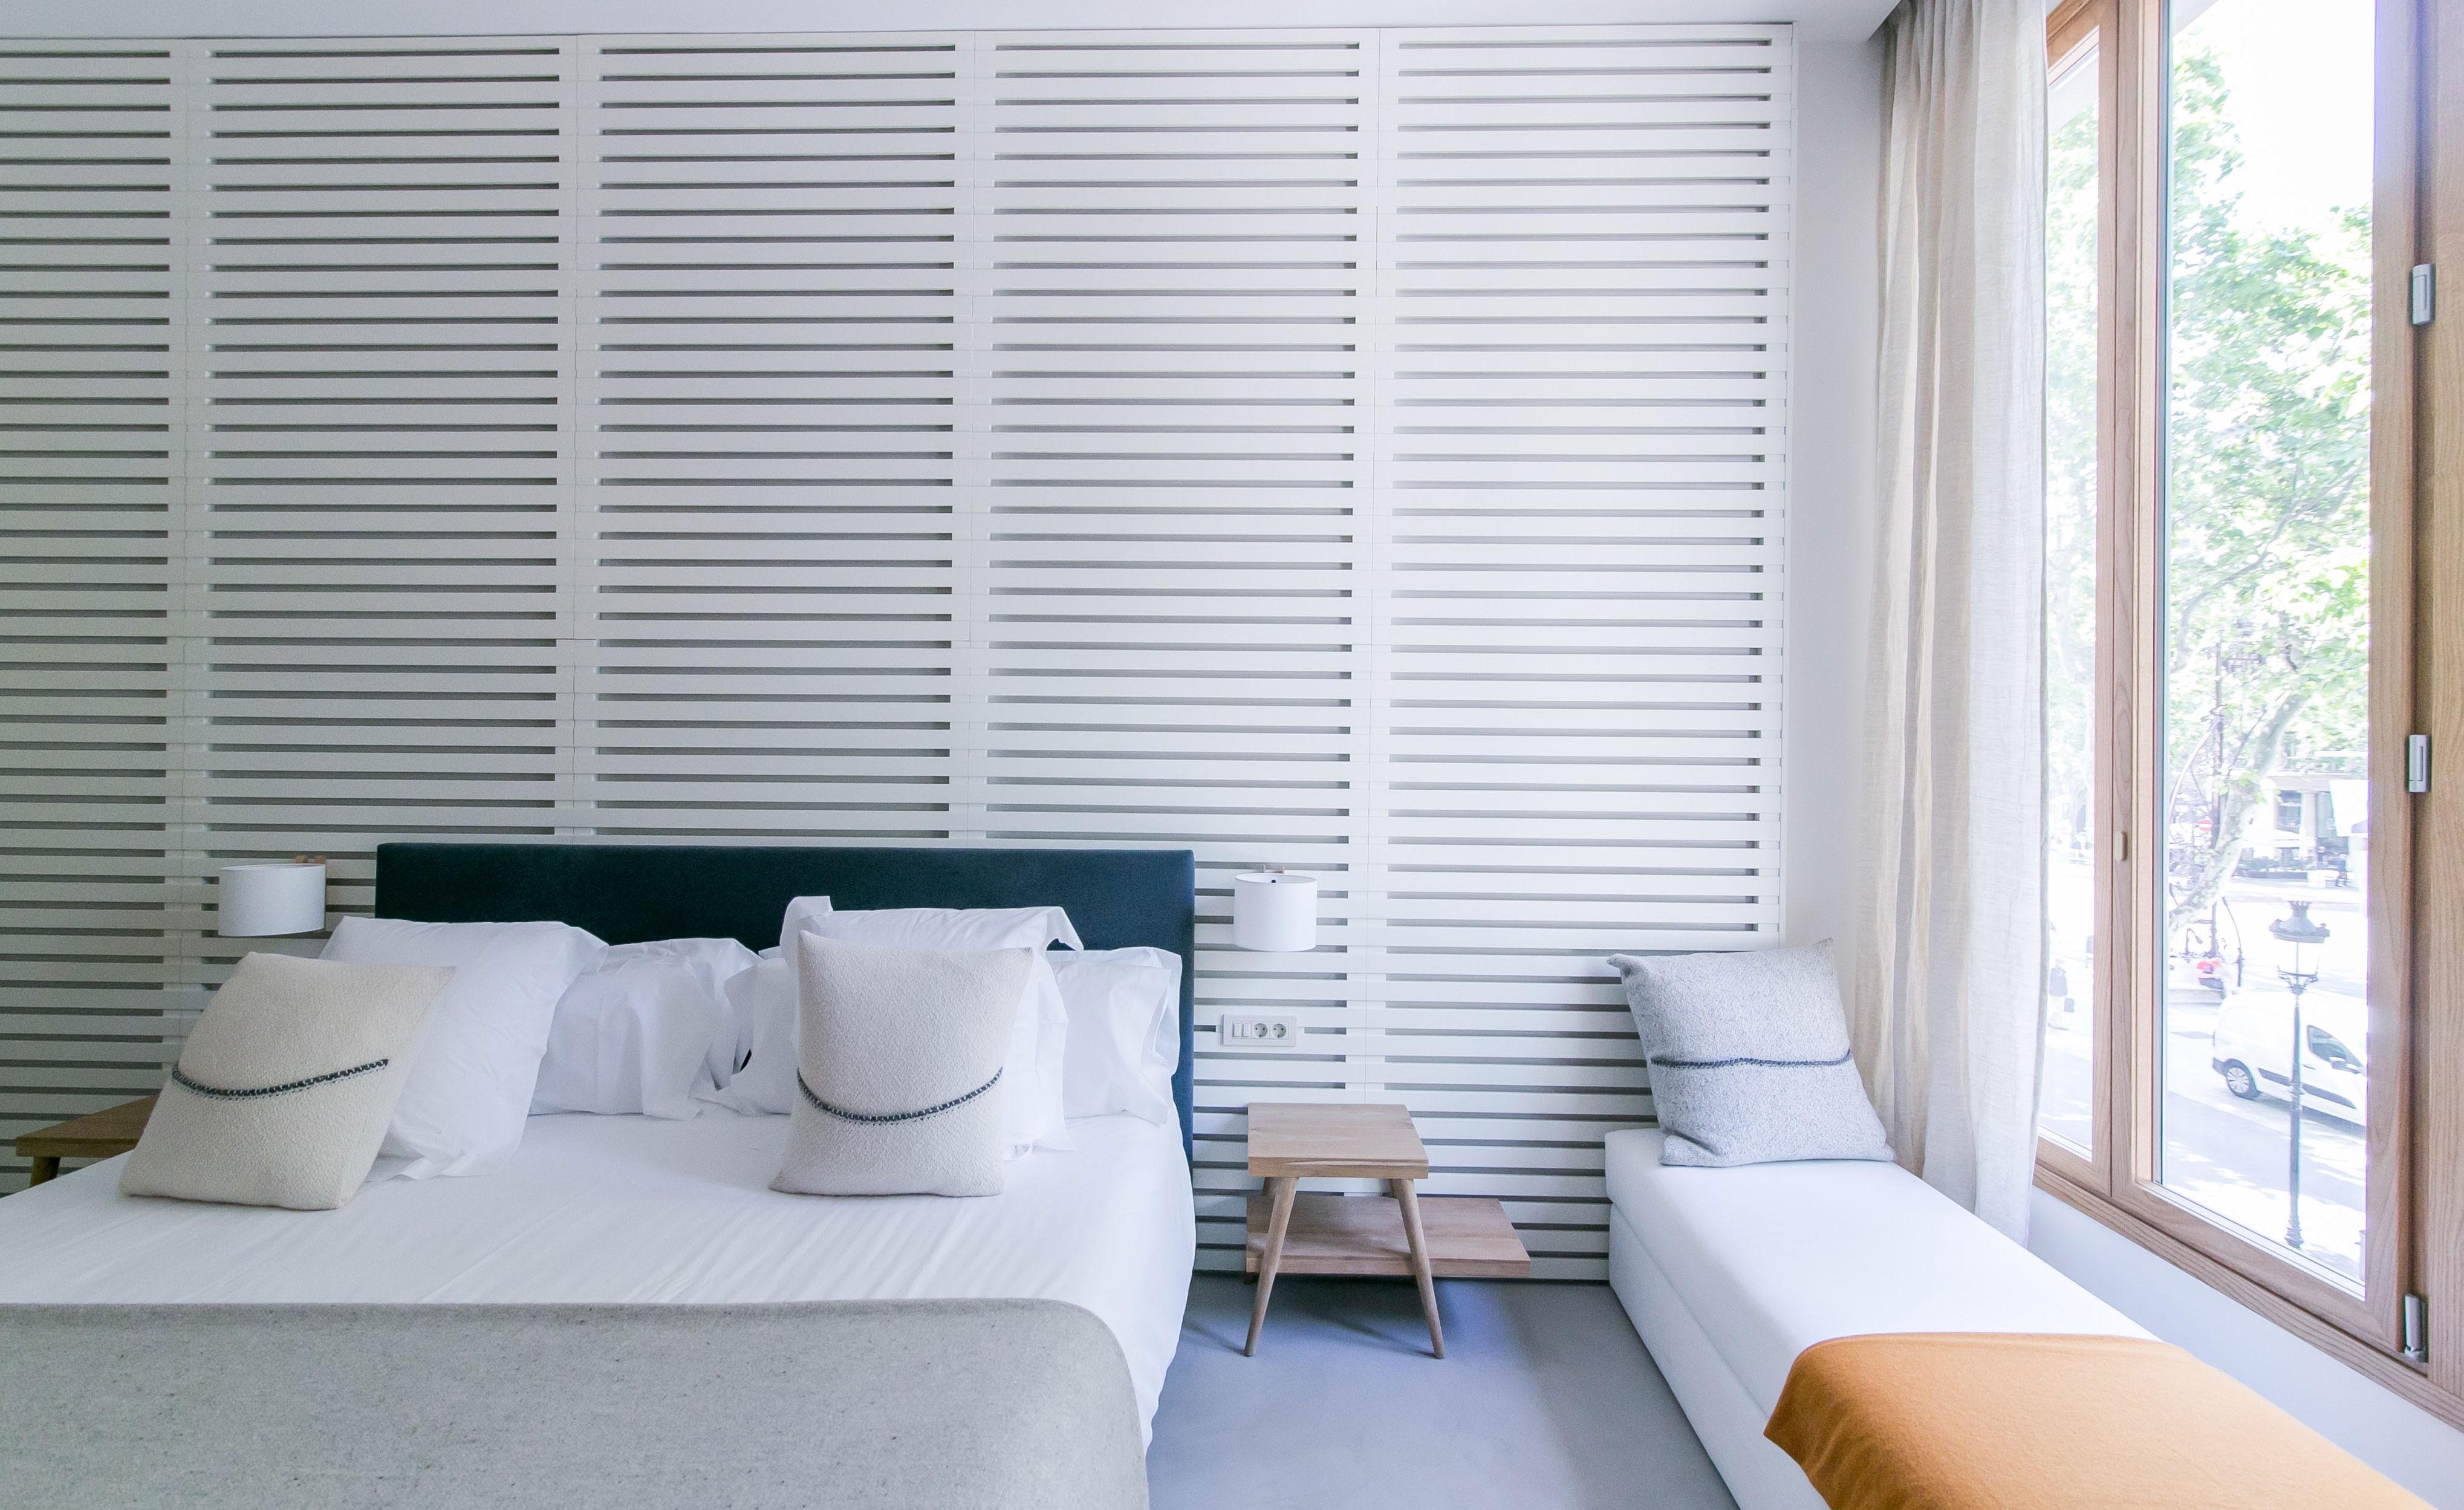 Margot tenenbaum inspire le design d un h tel de barcelone for Hotel design a barcelone